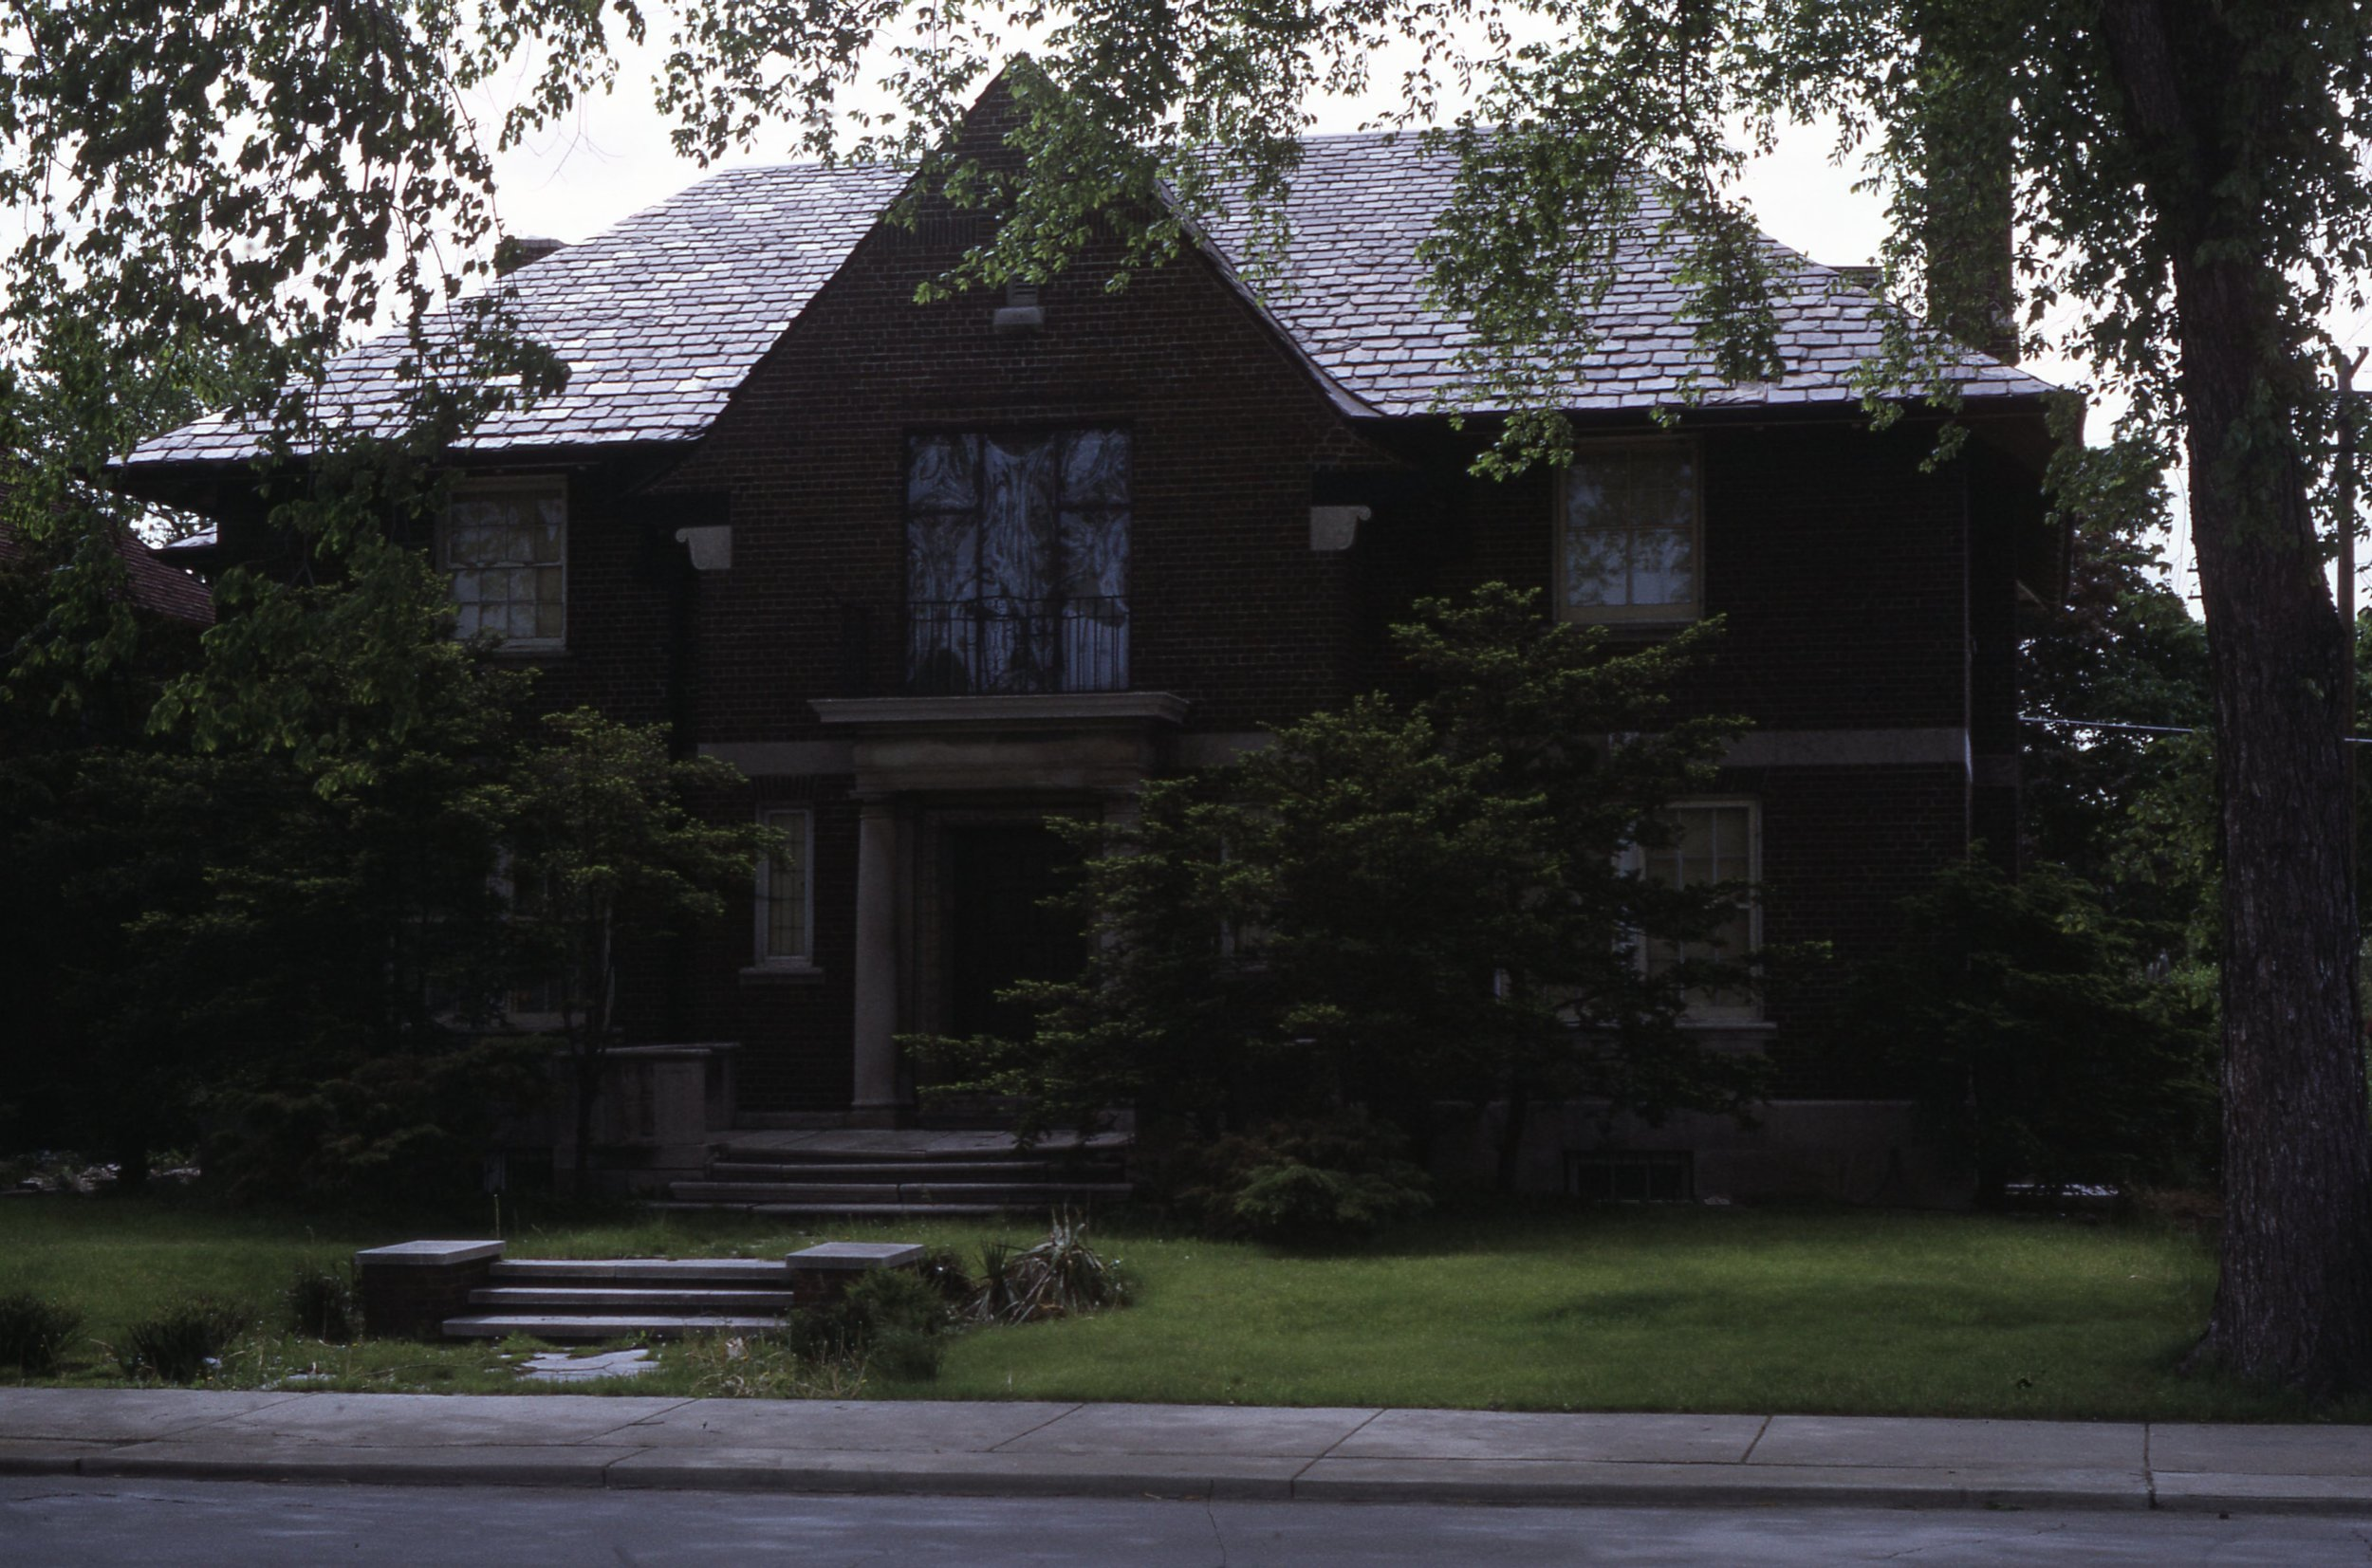 1261  W. Chicago 1974 - side.jpg